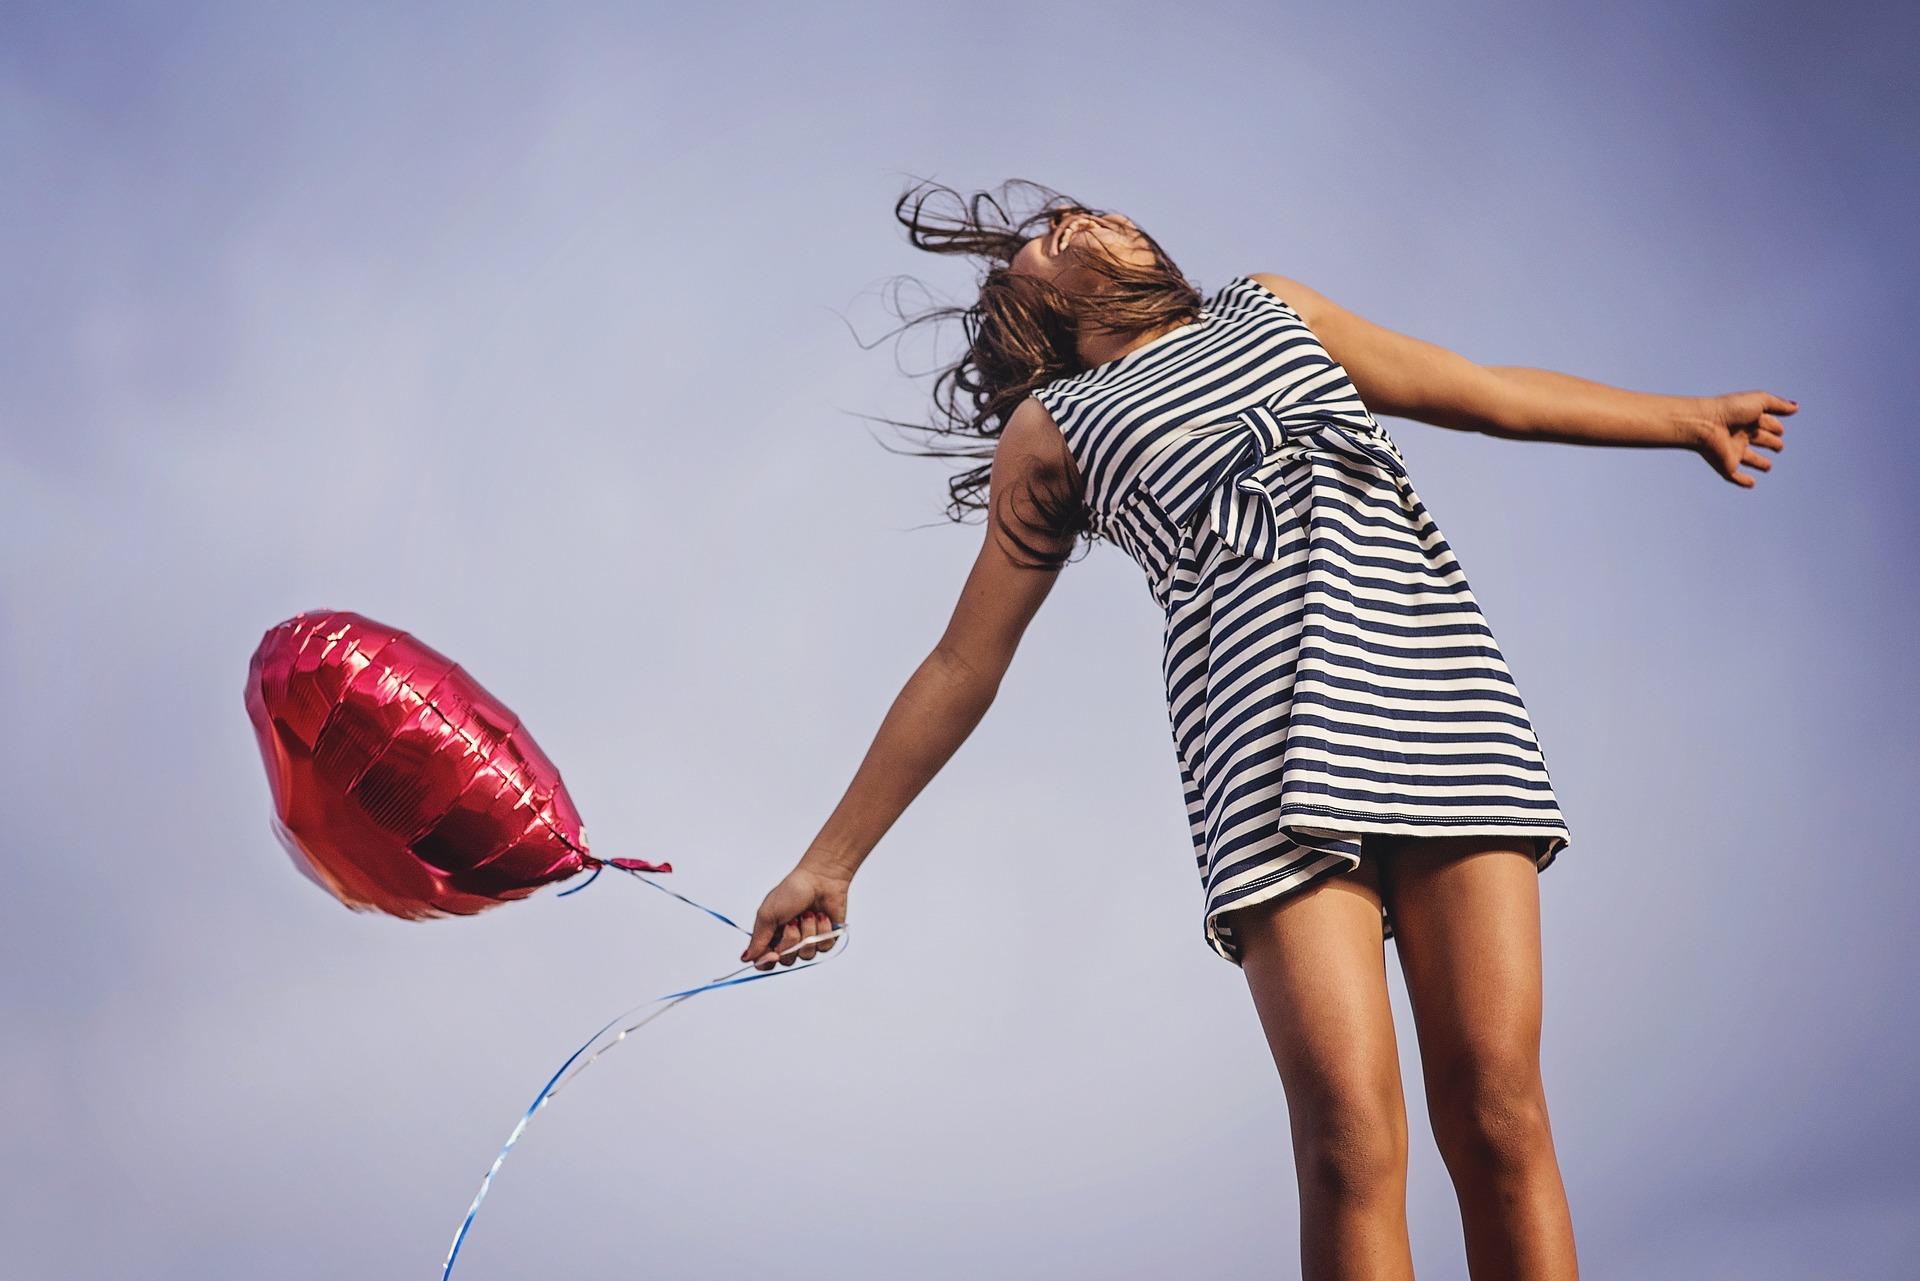 femme s'envolant avec un ballon